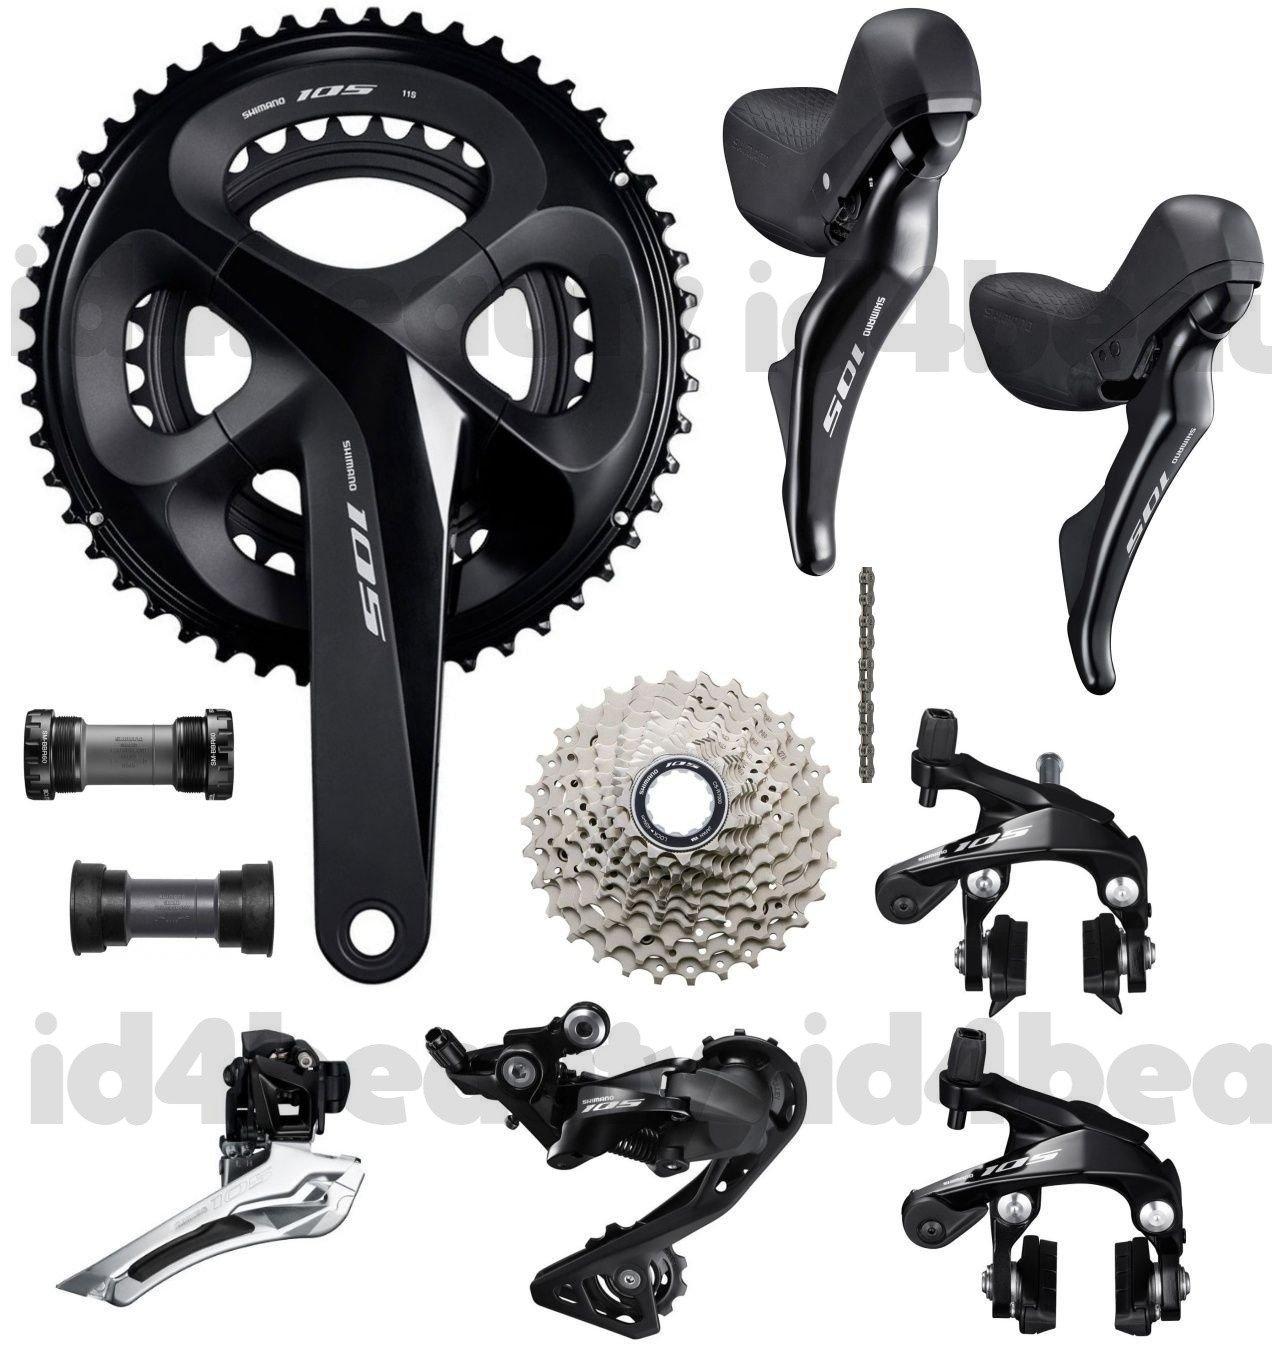 Shimano 105 R7000 Groupset 2x11-speed Road Bike 7Pcs Mechanical New 50//34T GS